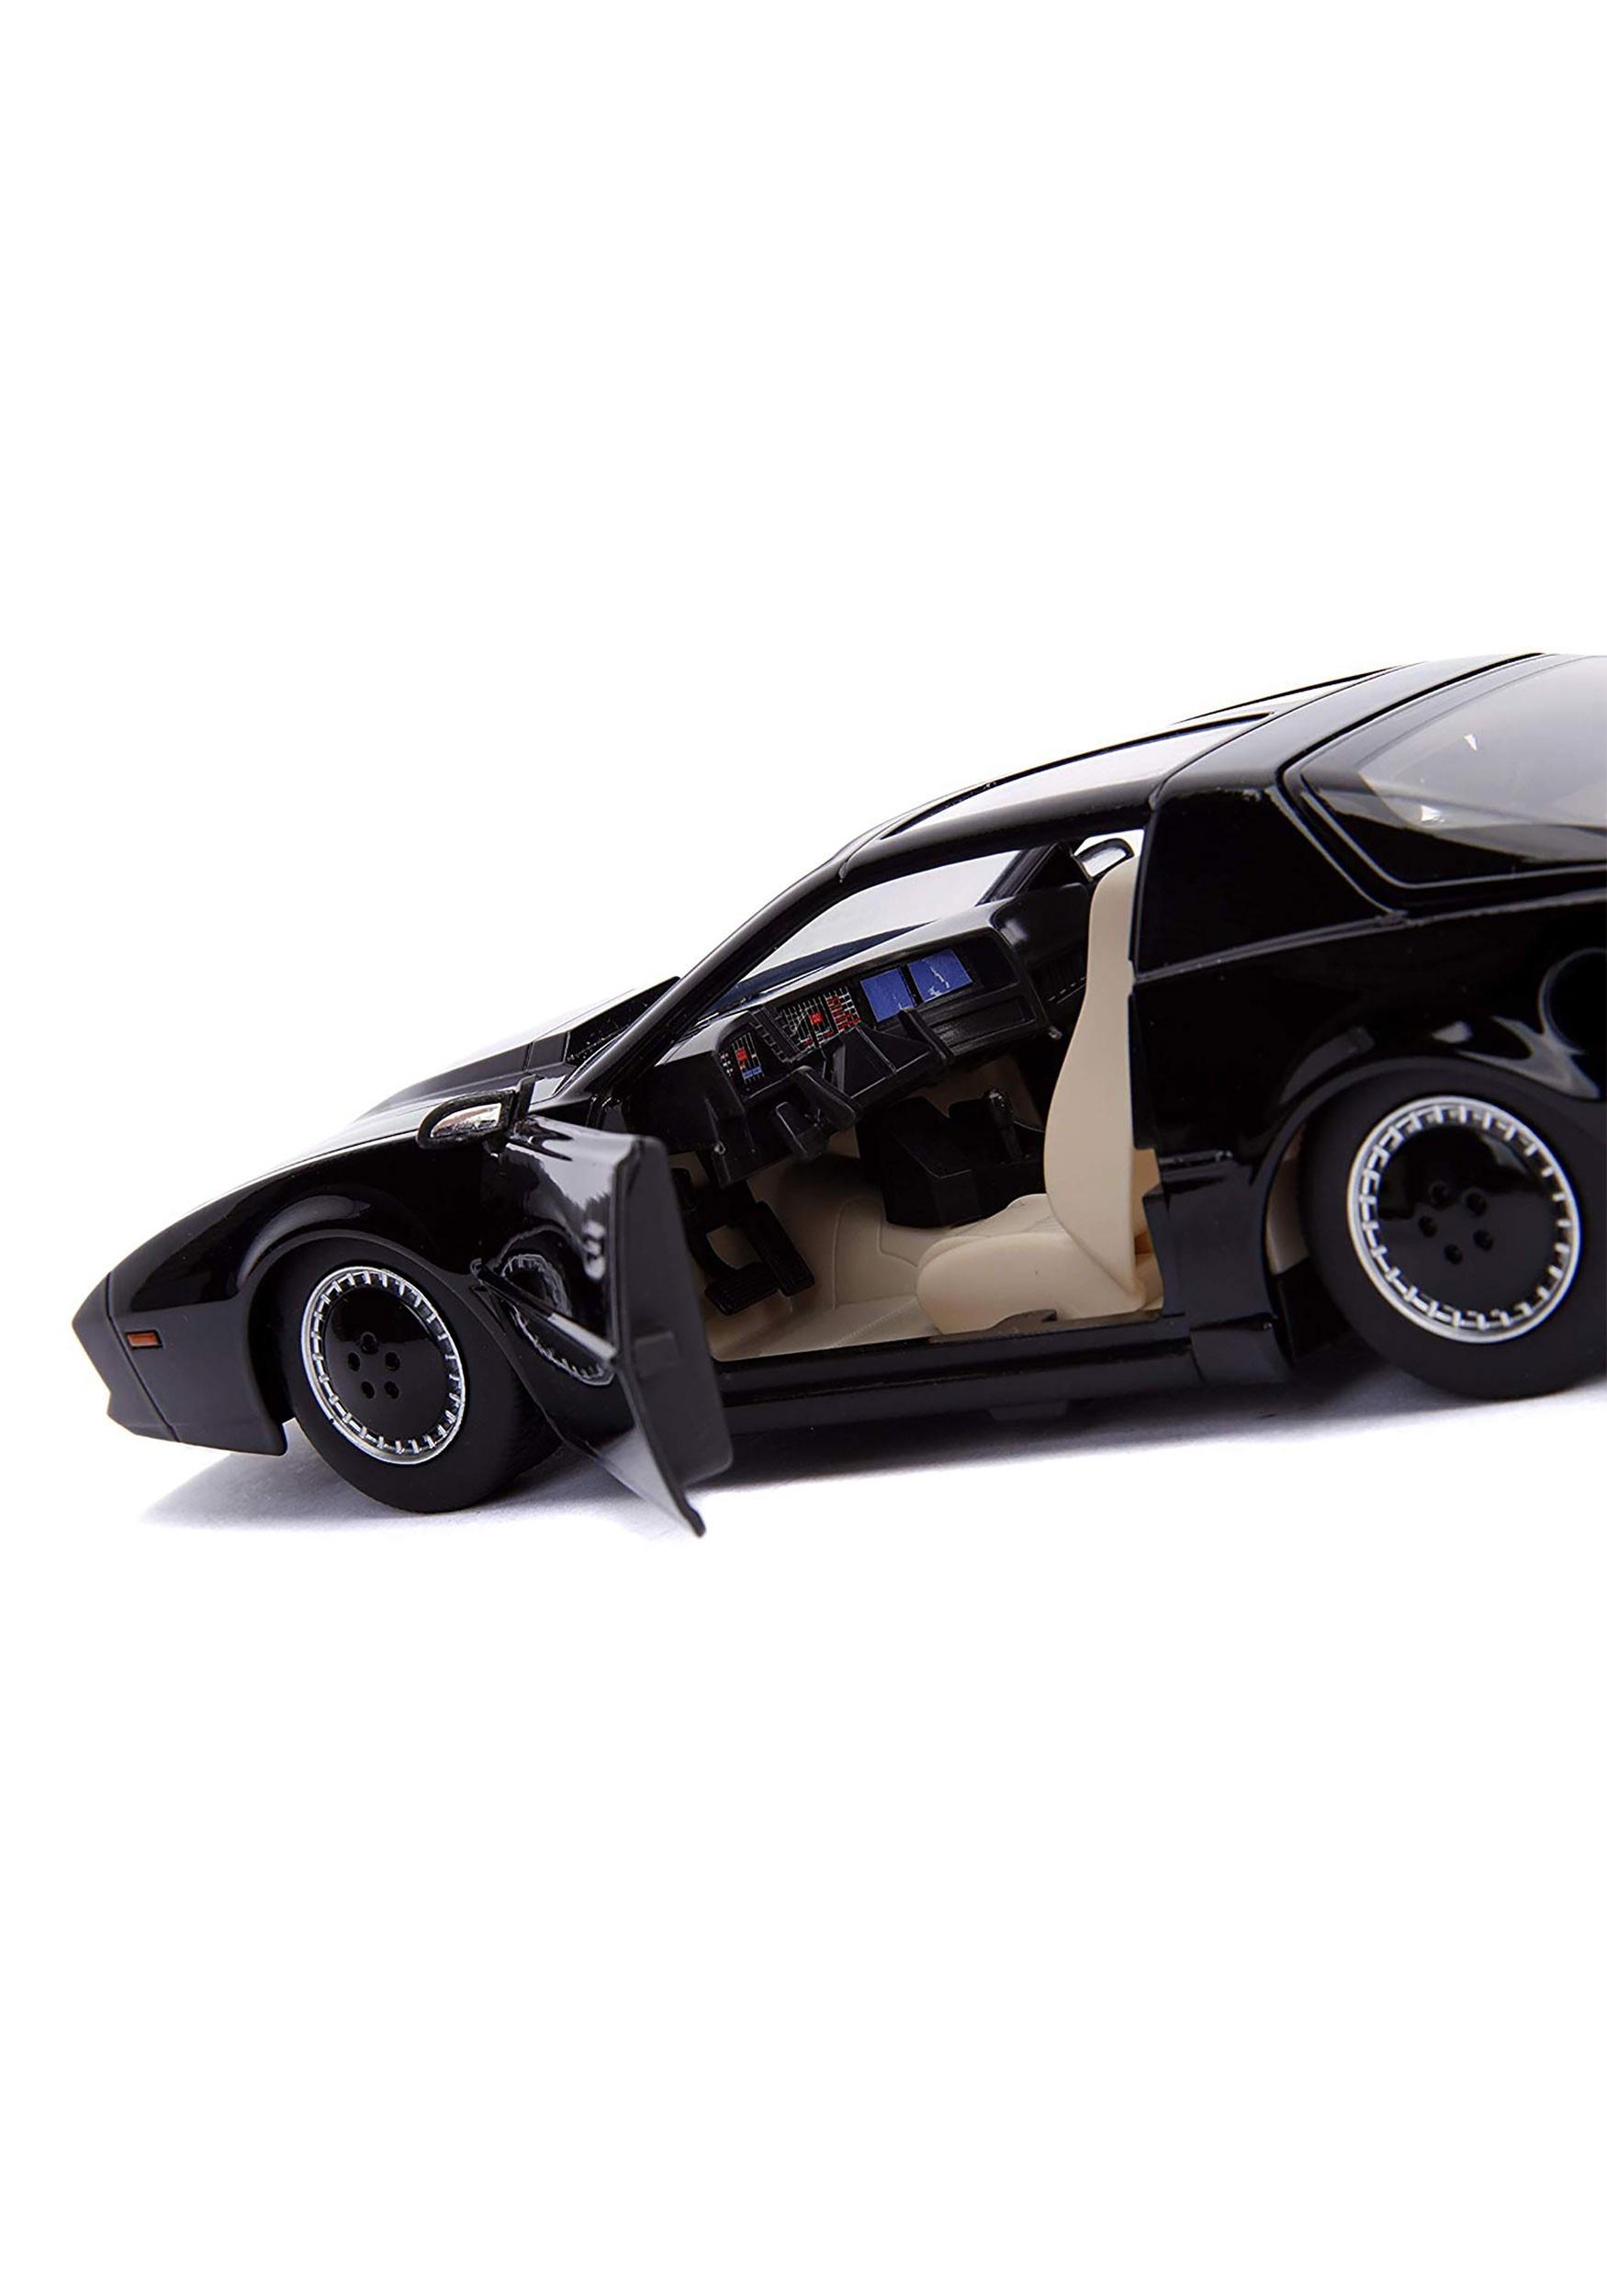 Hollywood Rides K.I.T.T. Knight Rider 1:24 Die Cast Vehicle w/ Light